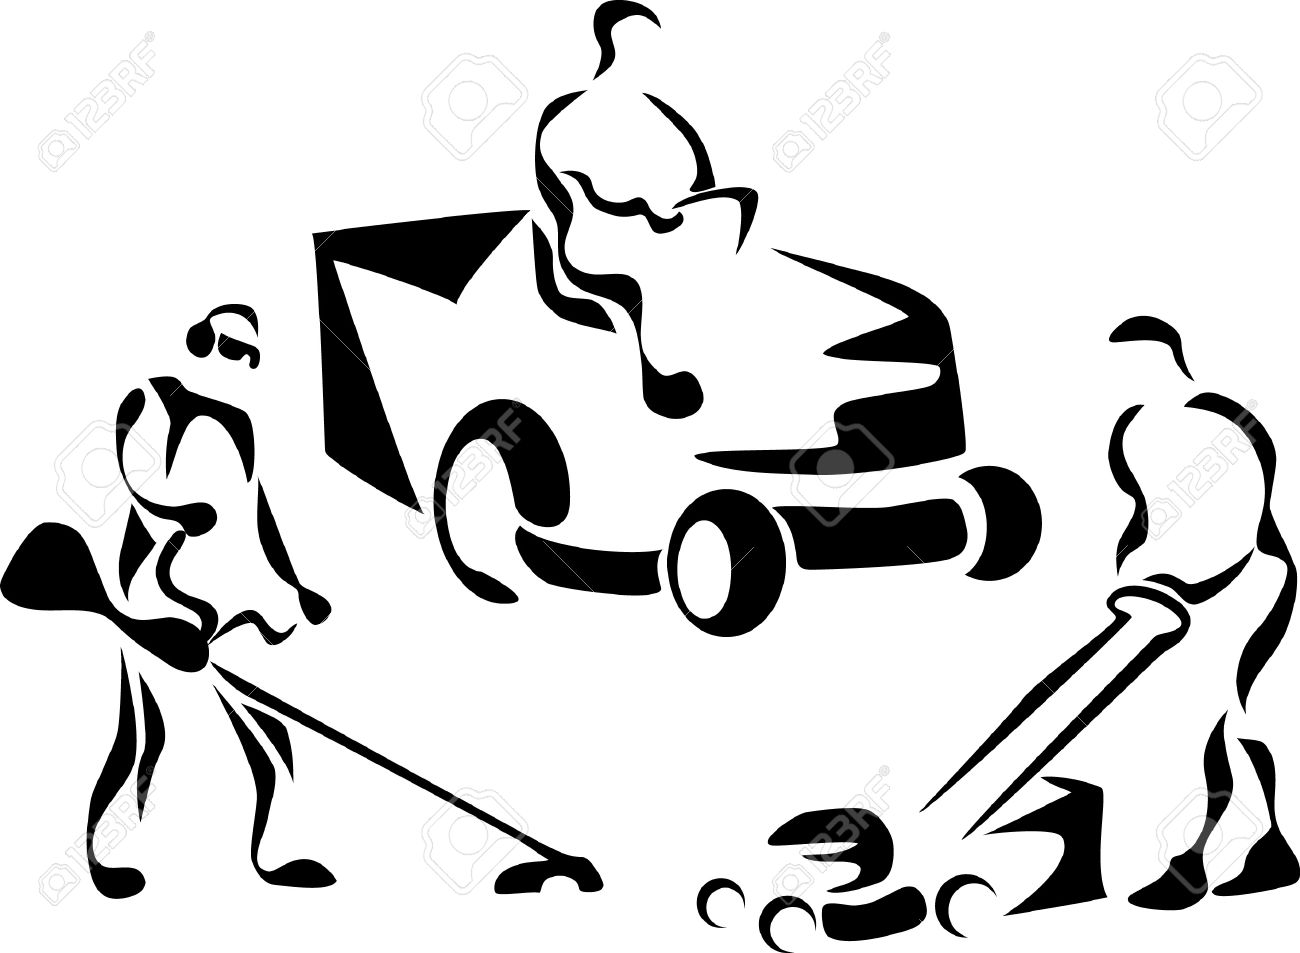 736 Lawn Mower free clipart.